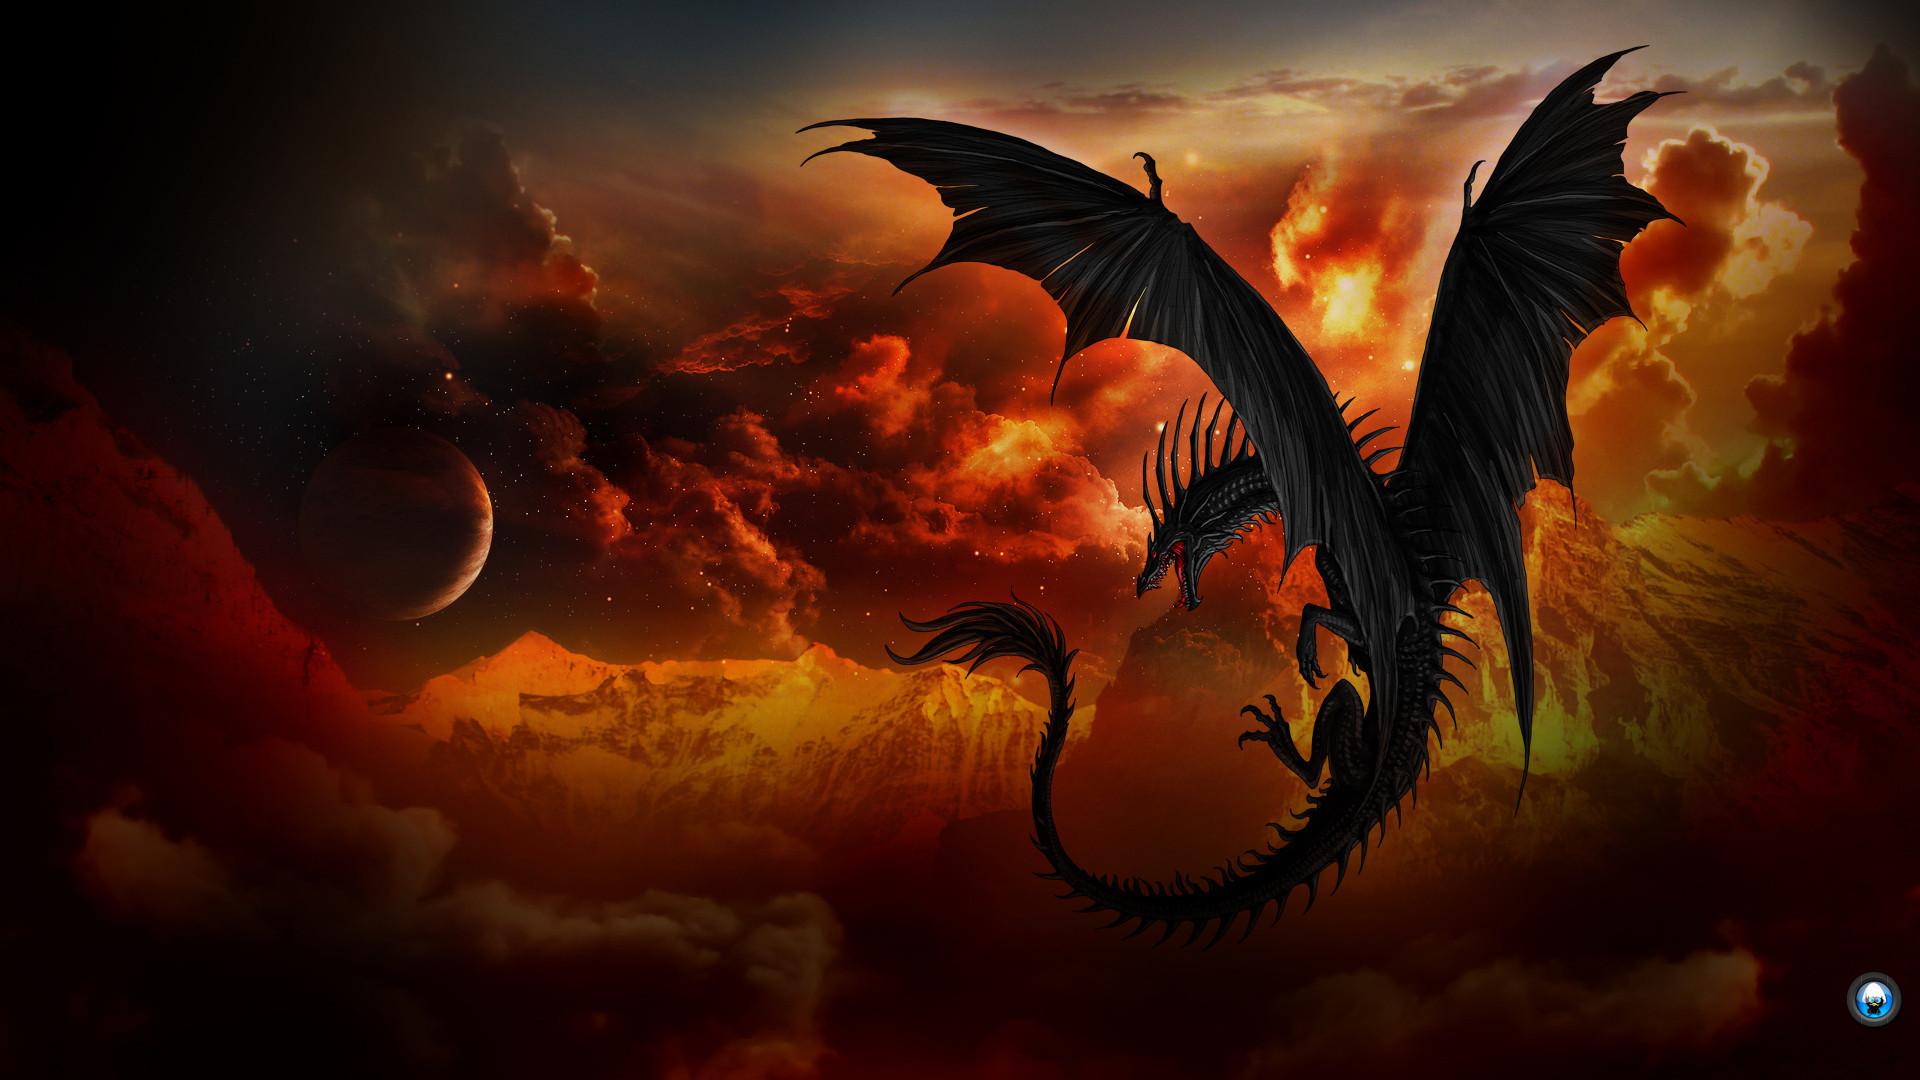 Dragon HD Wallpapers Backgrounds Wallpaper Dragon Backgrounds For Desktop  Wallpapers)